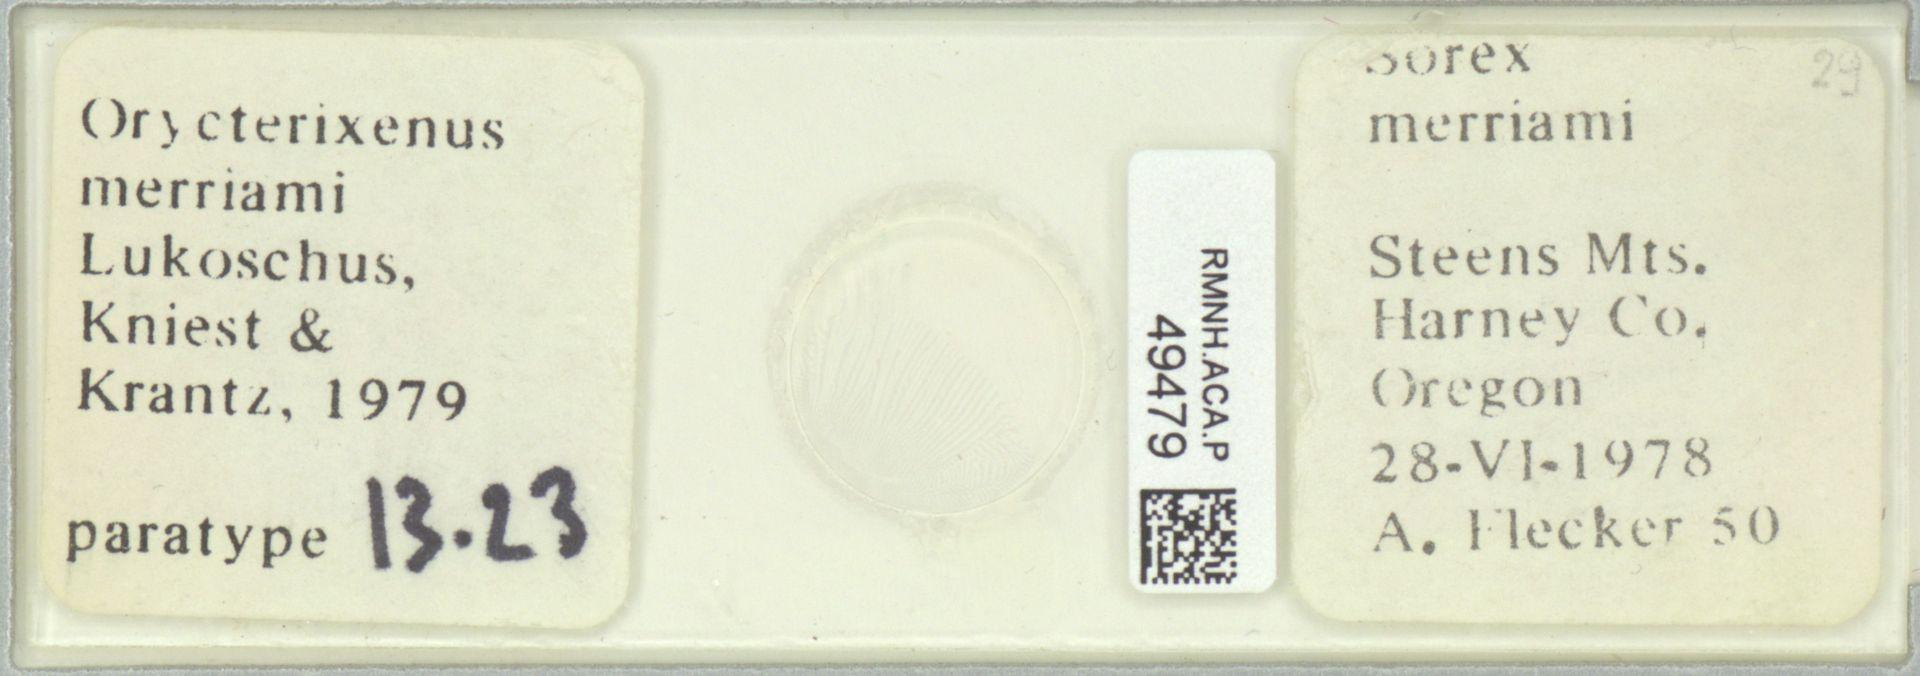 RMNH.ACA.P.49479   Orycterixenus merriami Lukoschus, Kniest & Krantz, 1979